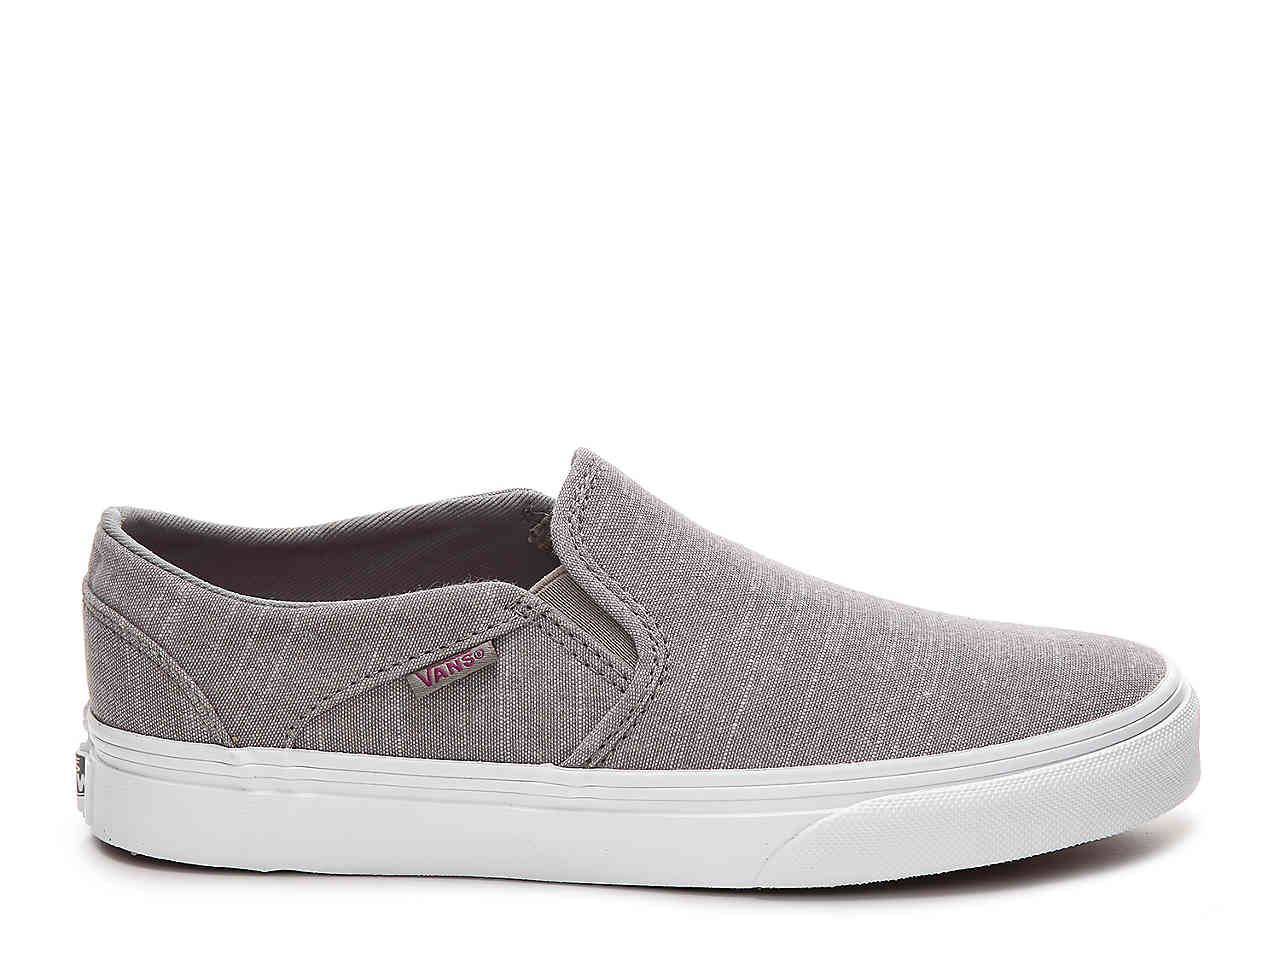 Vans Asher Chambray Slip-On Sneaker - Women s Women s Shoes  44ac467bb